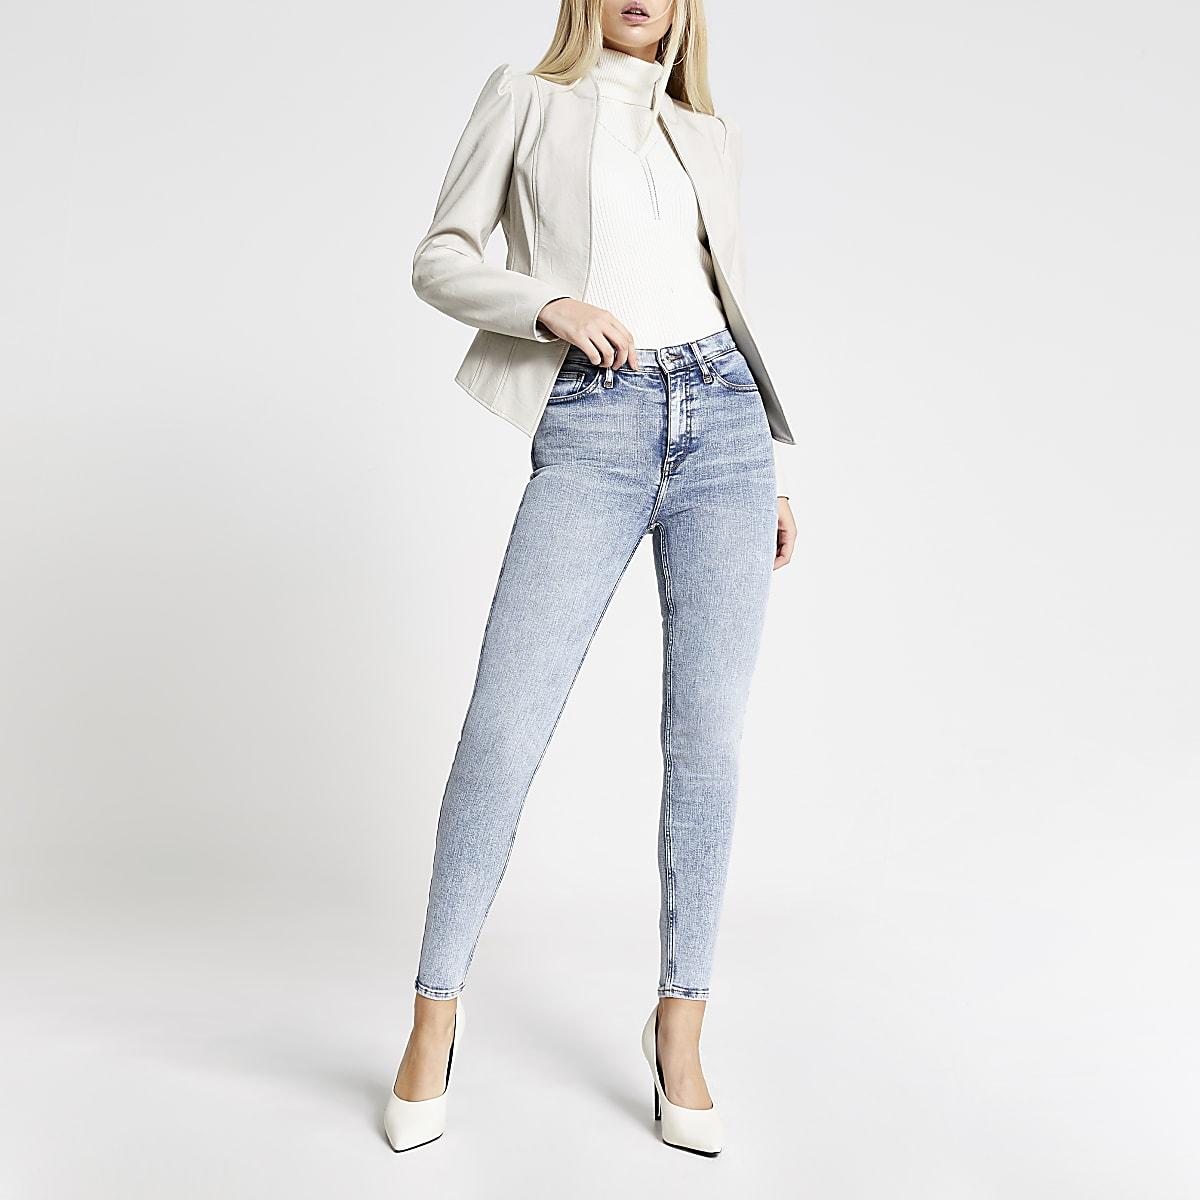 Hailey - Blauwe acid wash denim jeans met hoge taille